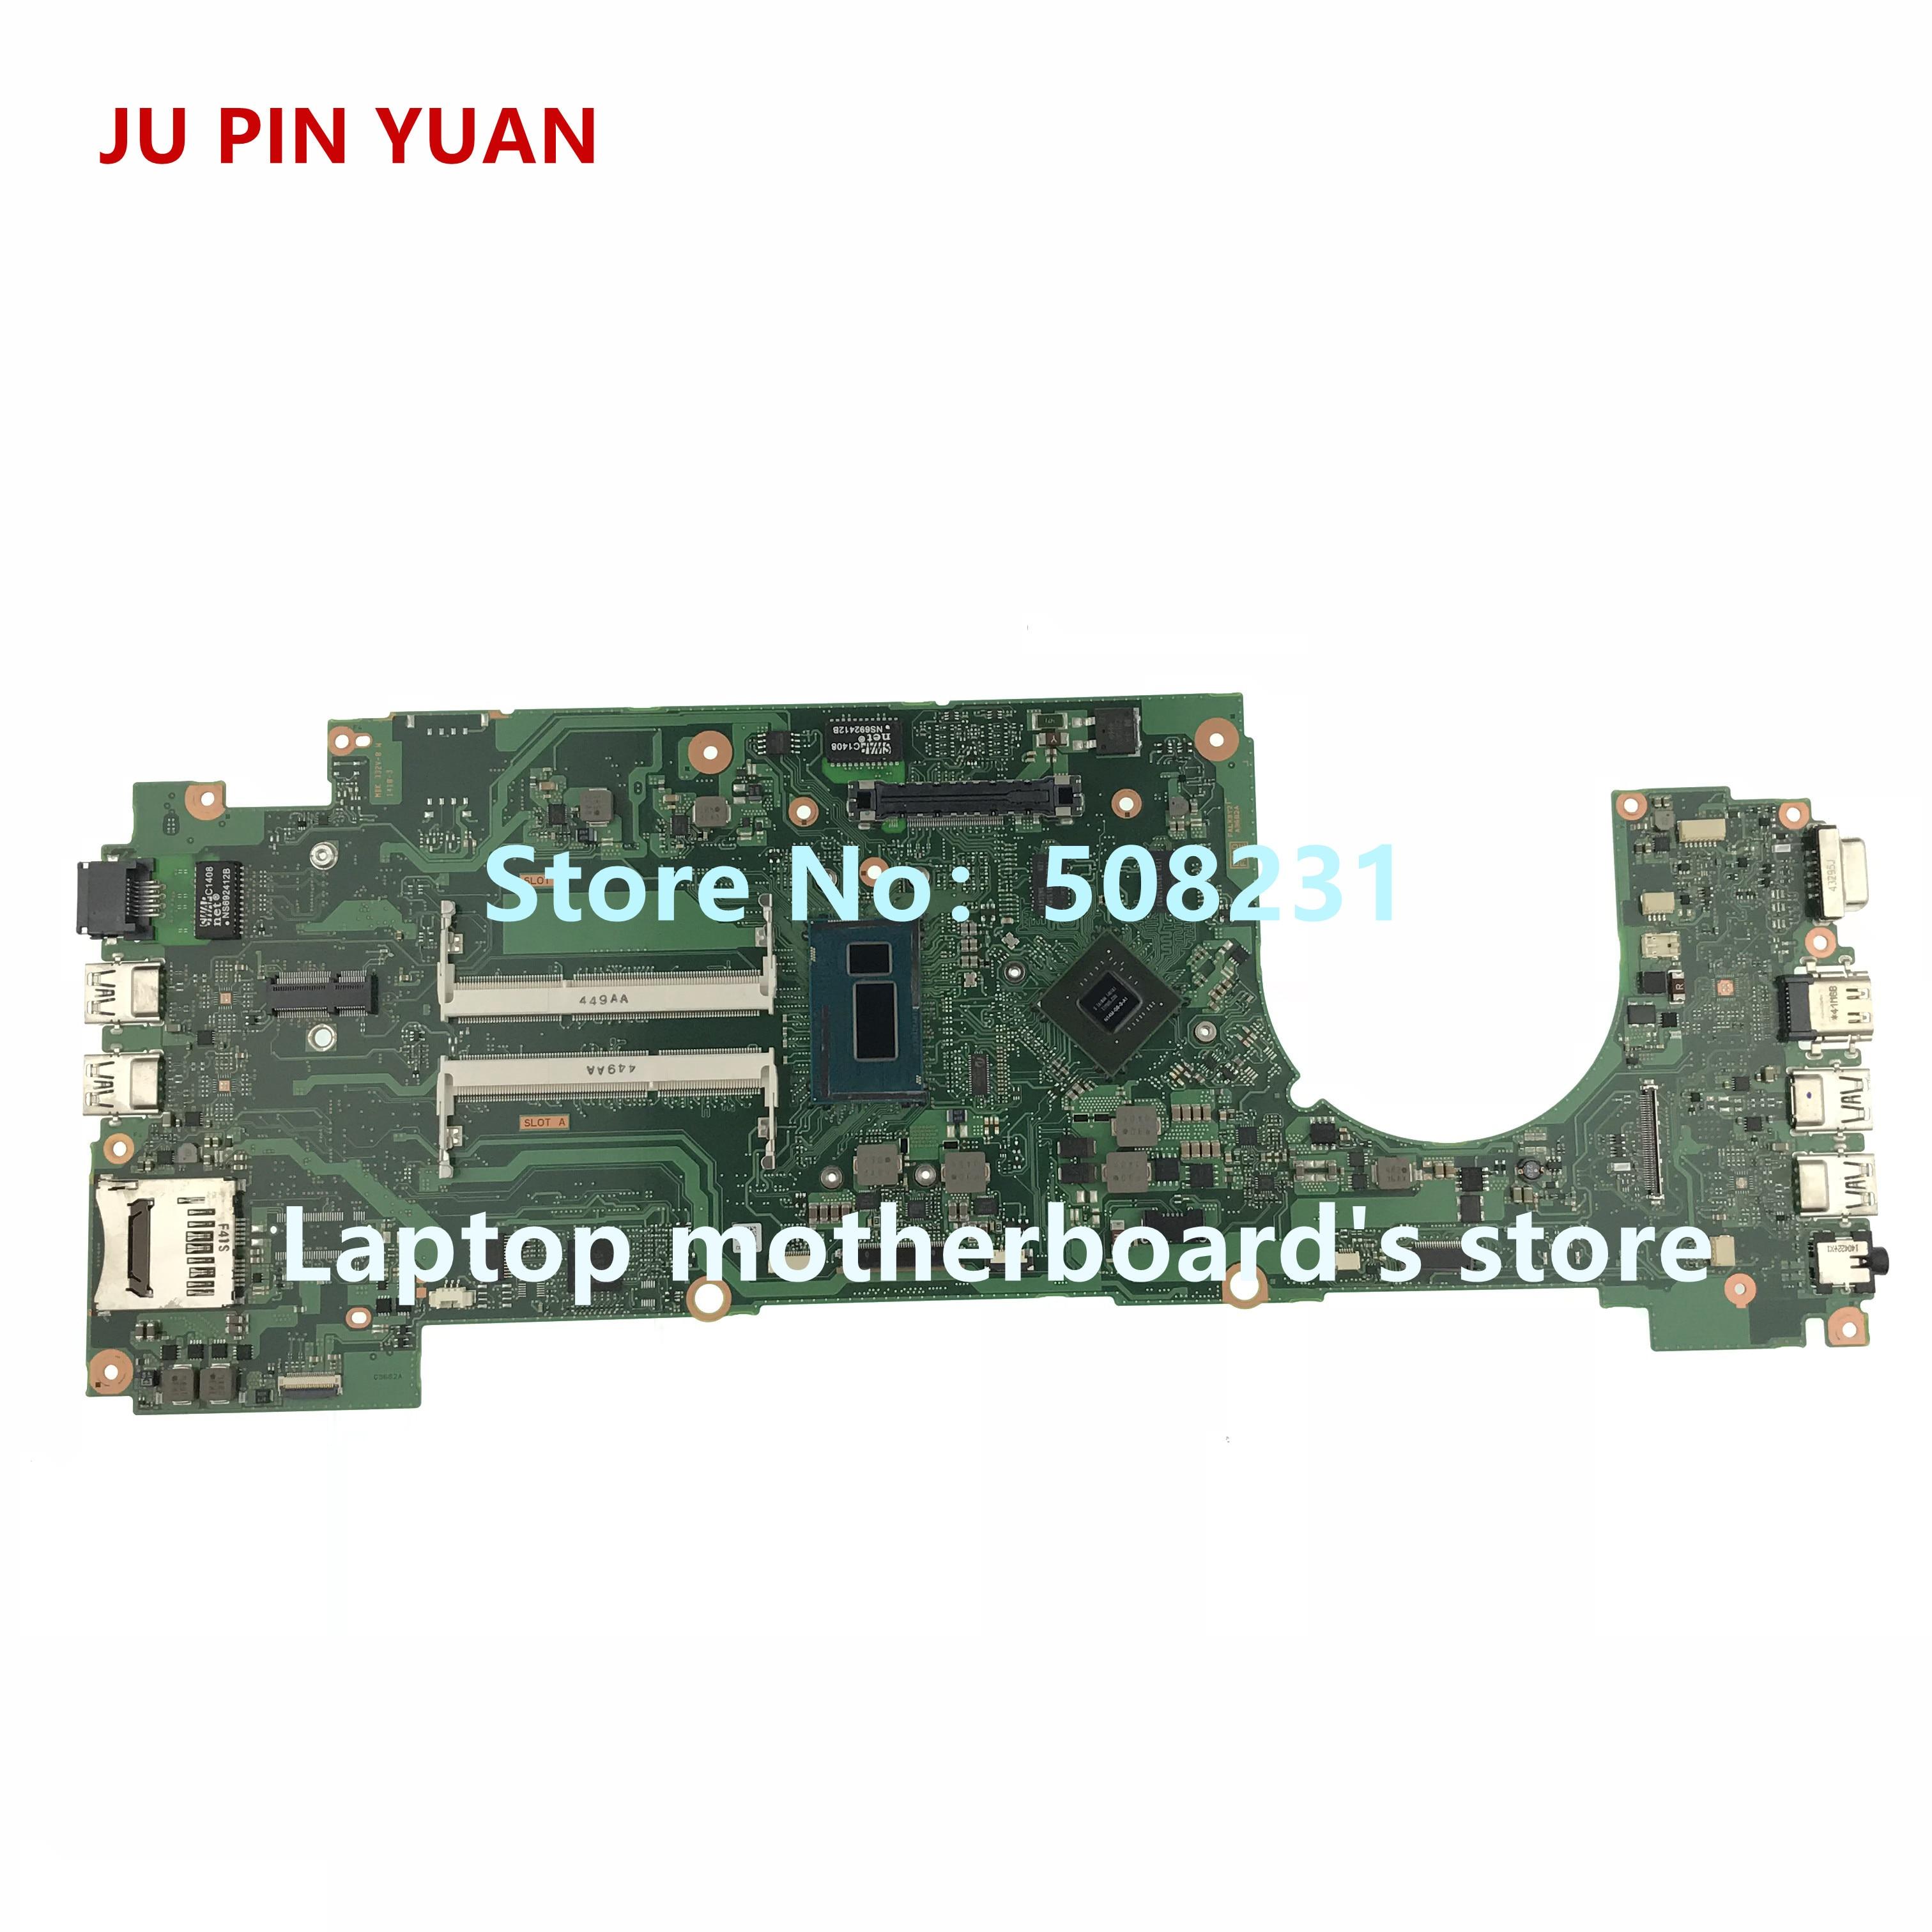 JU PIN YUAN FALXSY2 A3682A Z55-A laptop Motherboard mainboard Para Toshiba Tecra Z50 Z55 Z50-A com i7-4600U perfeito funcionamento